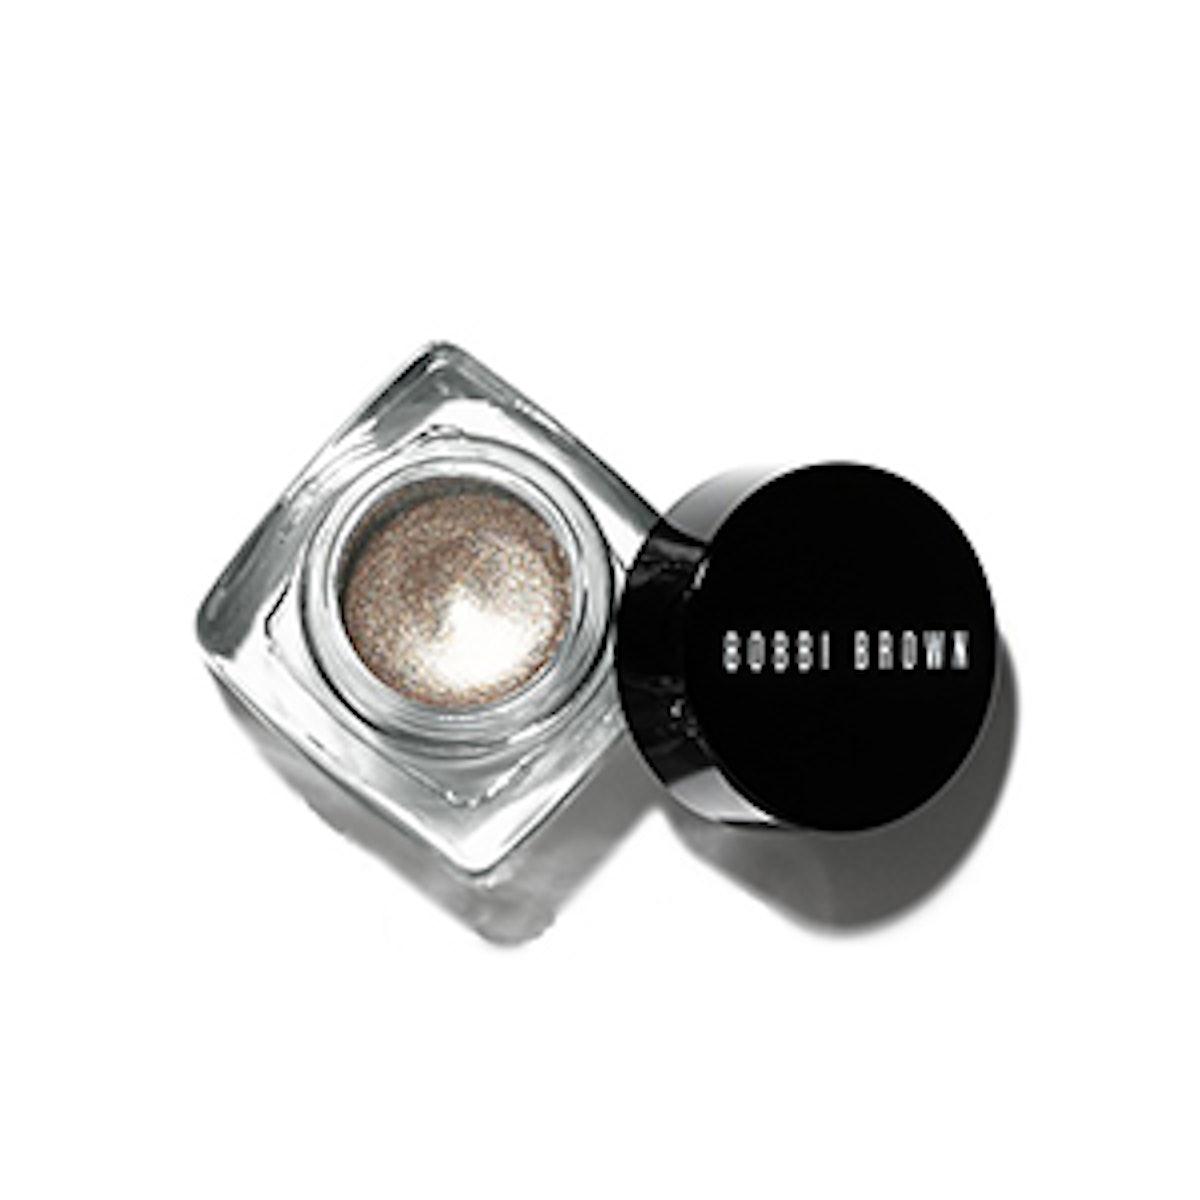 Long-Wear Cream Eyeshadow In Gold Stone